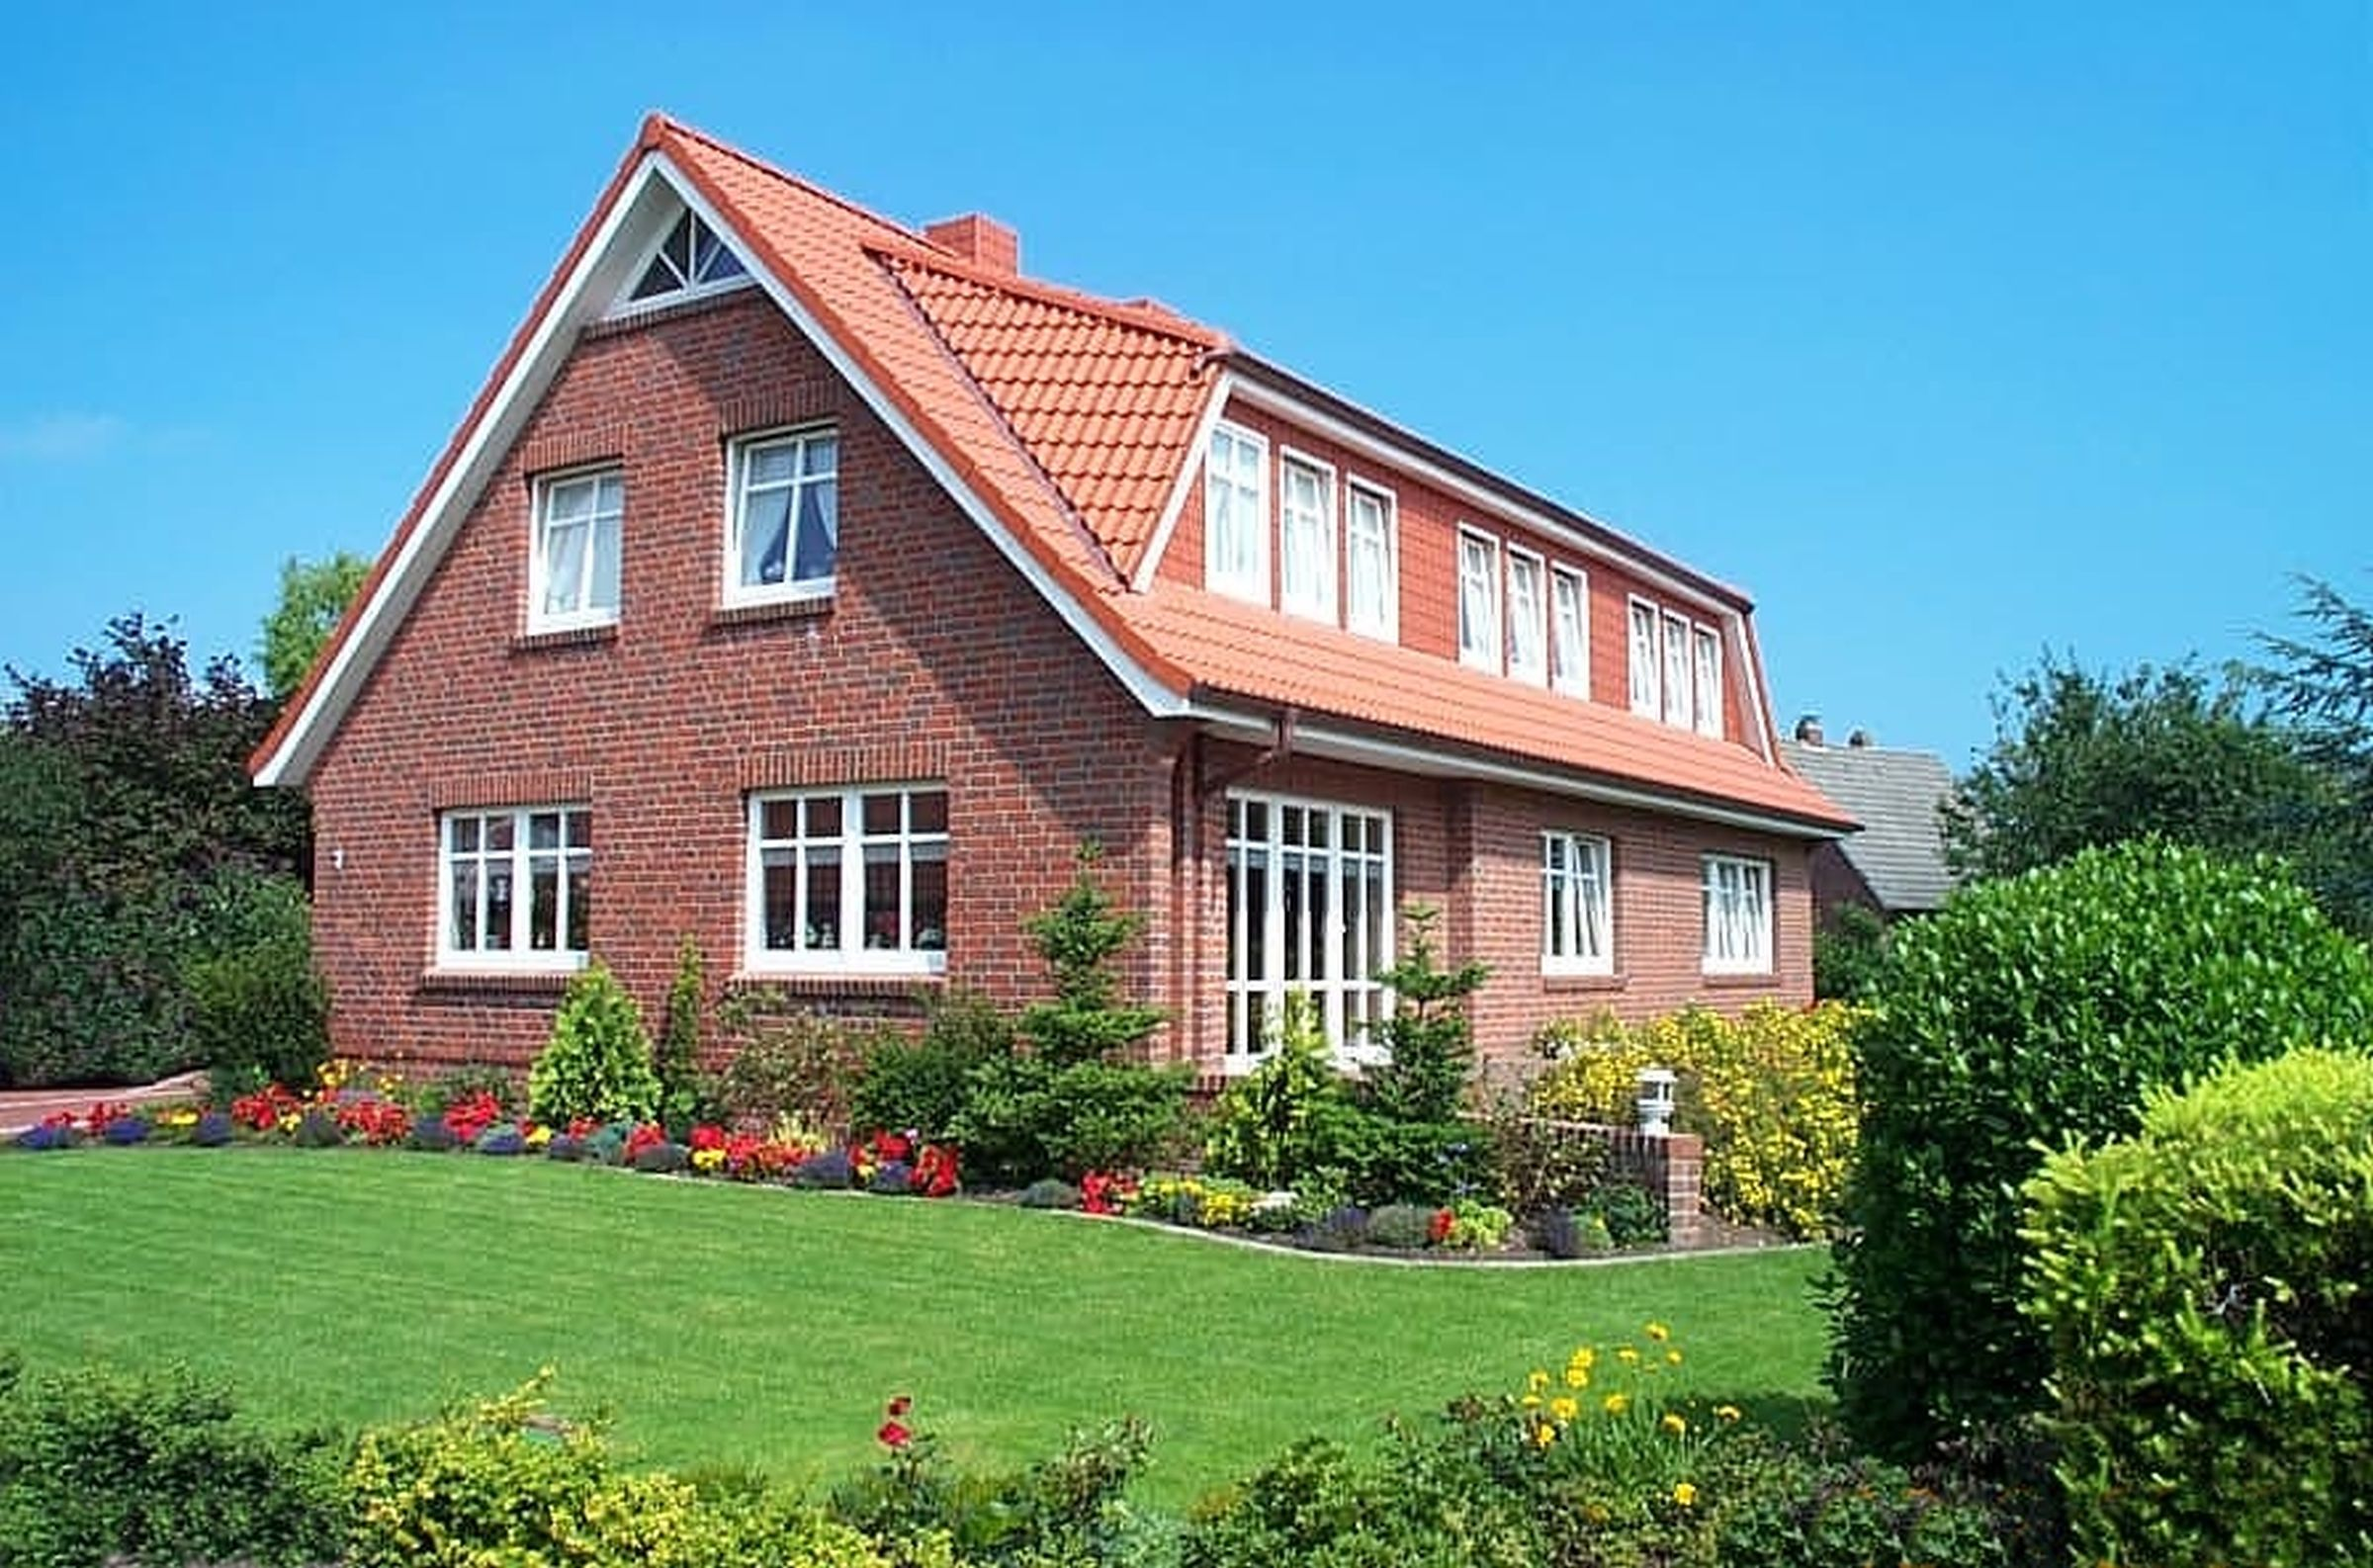 Ferienhaus Ilse Hans, (Horumersiel-Schillig). Feri